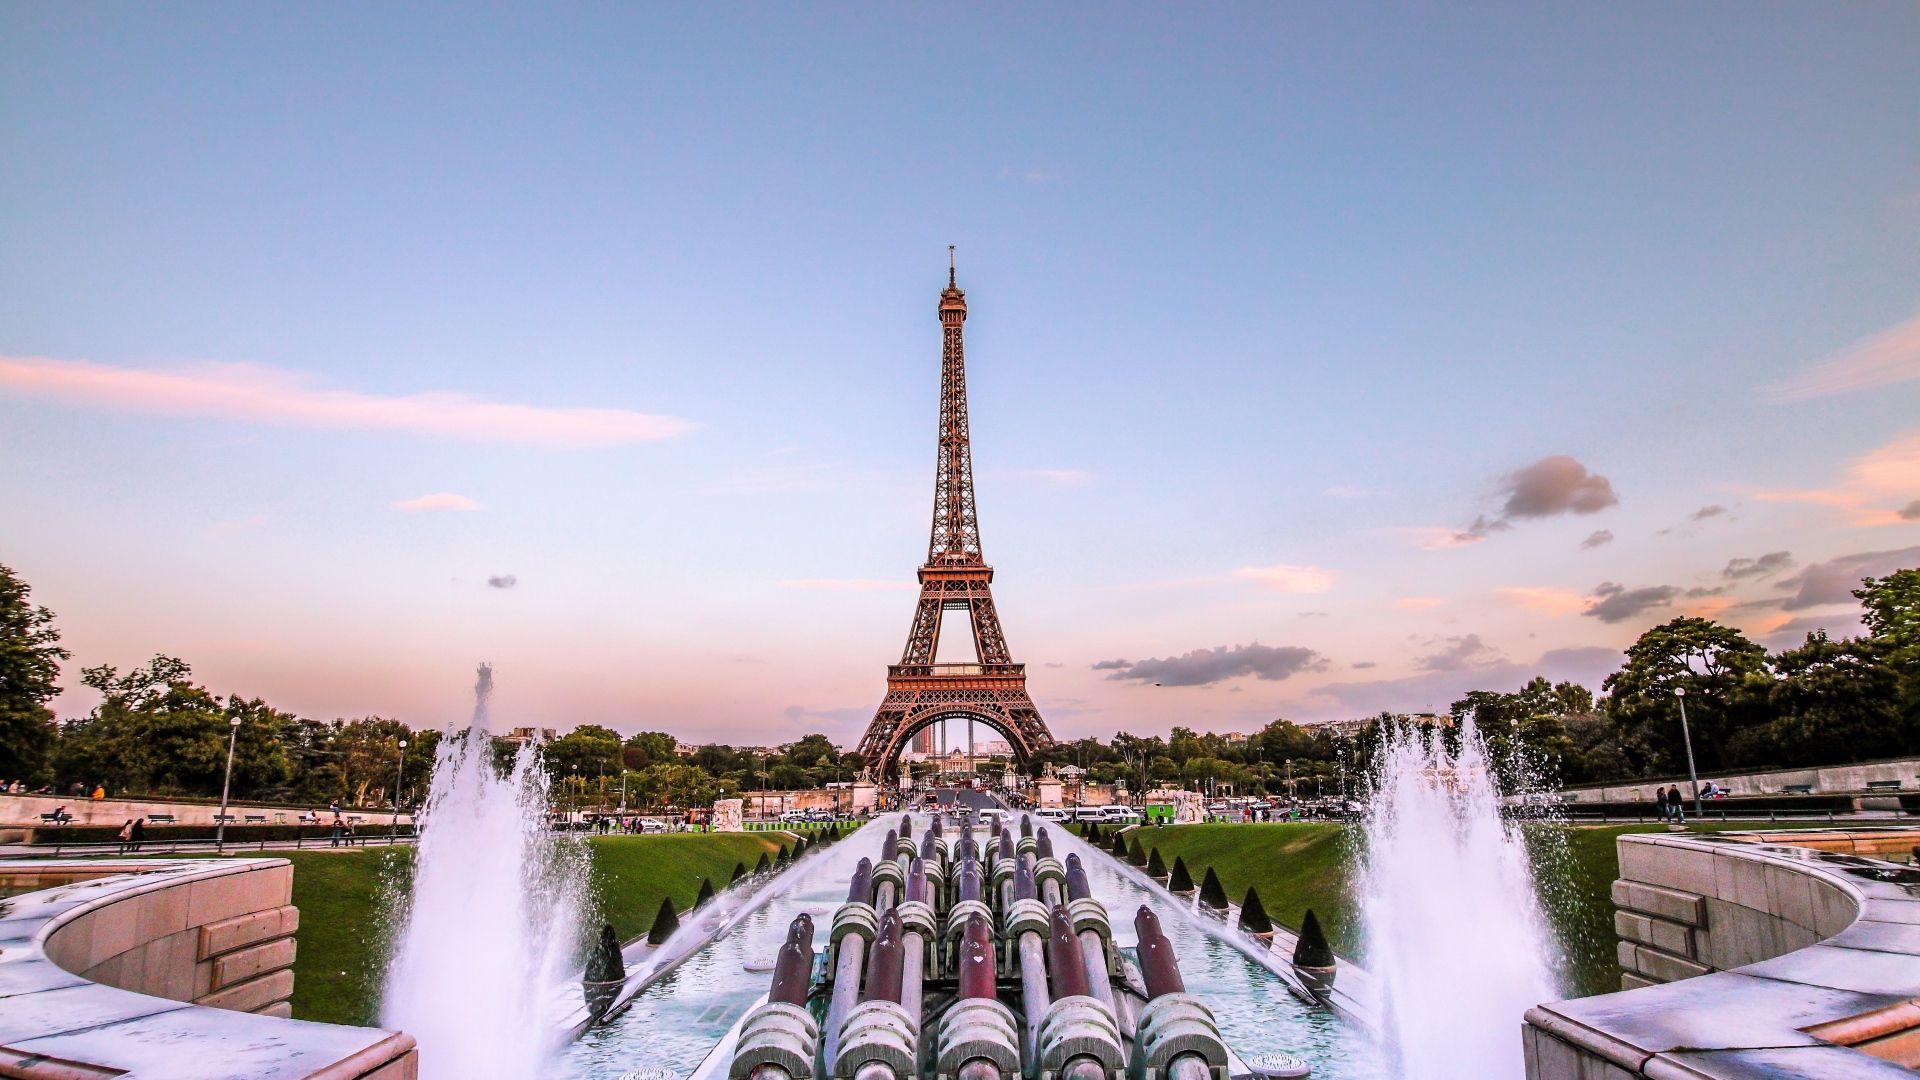 Eiffel Tower 1920 1080 Eiffel Tower Pictures Eiffel Tower Paris Wallpaper Full hd eiffel tower wallpaper hd 1080p